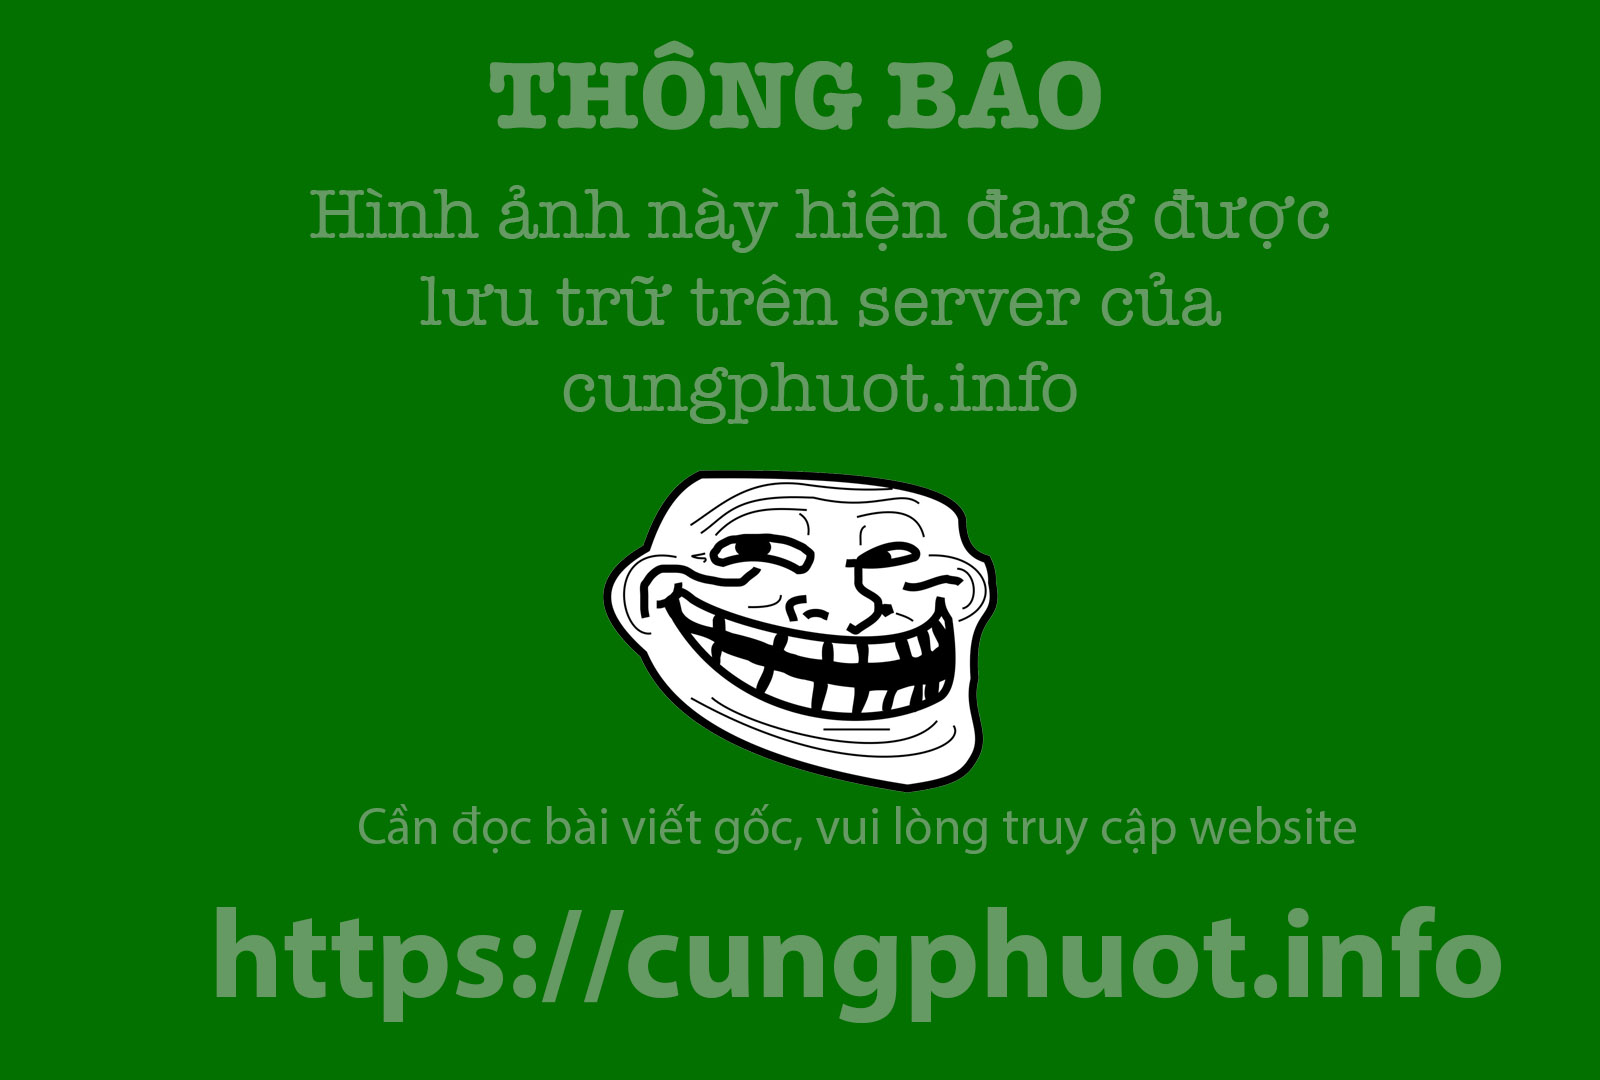 Ly Son: Nguon goc so khai va nhung dieu can thay doi hinh anh 3